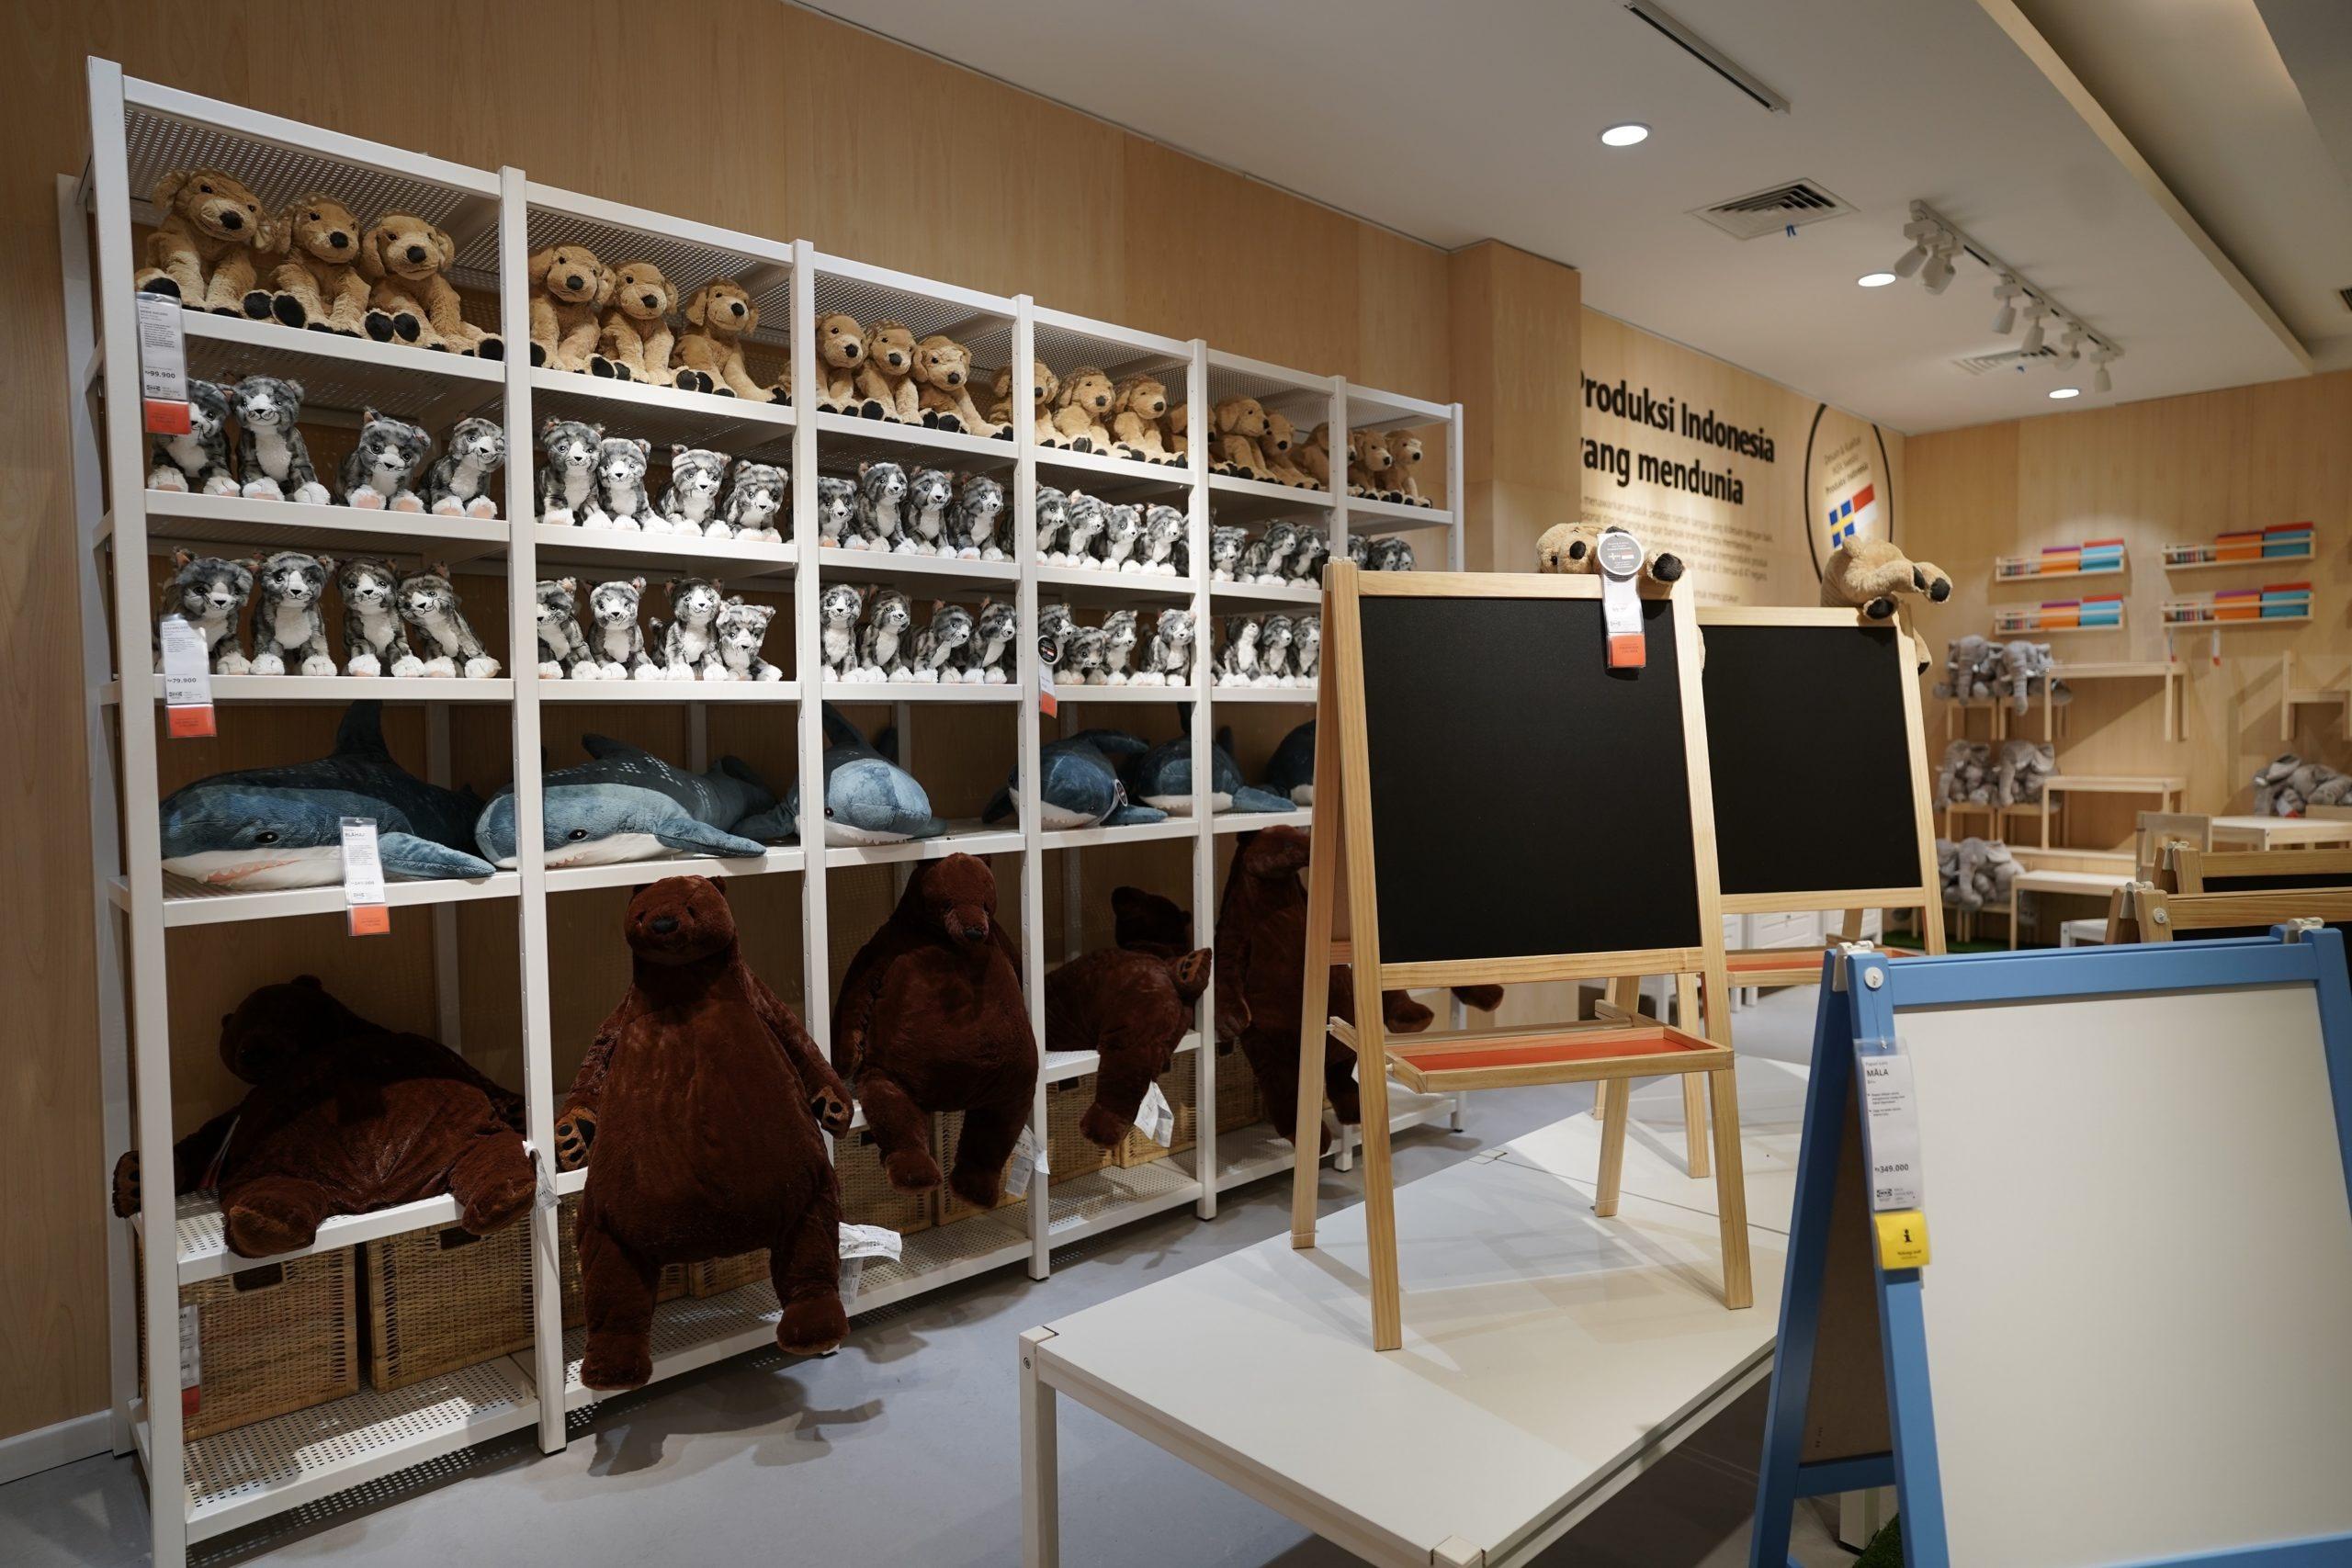 ikea sentul city opening made in indonesia